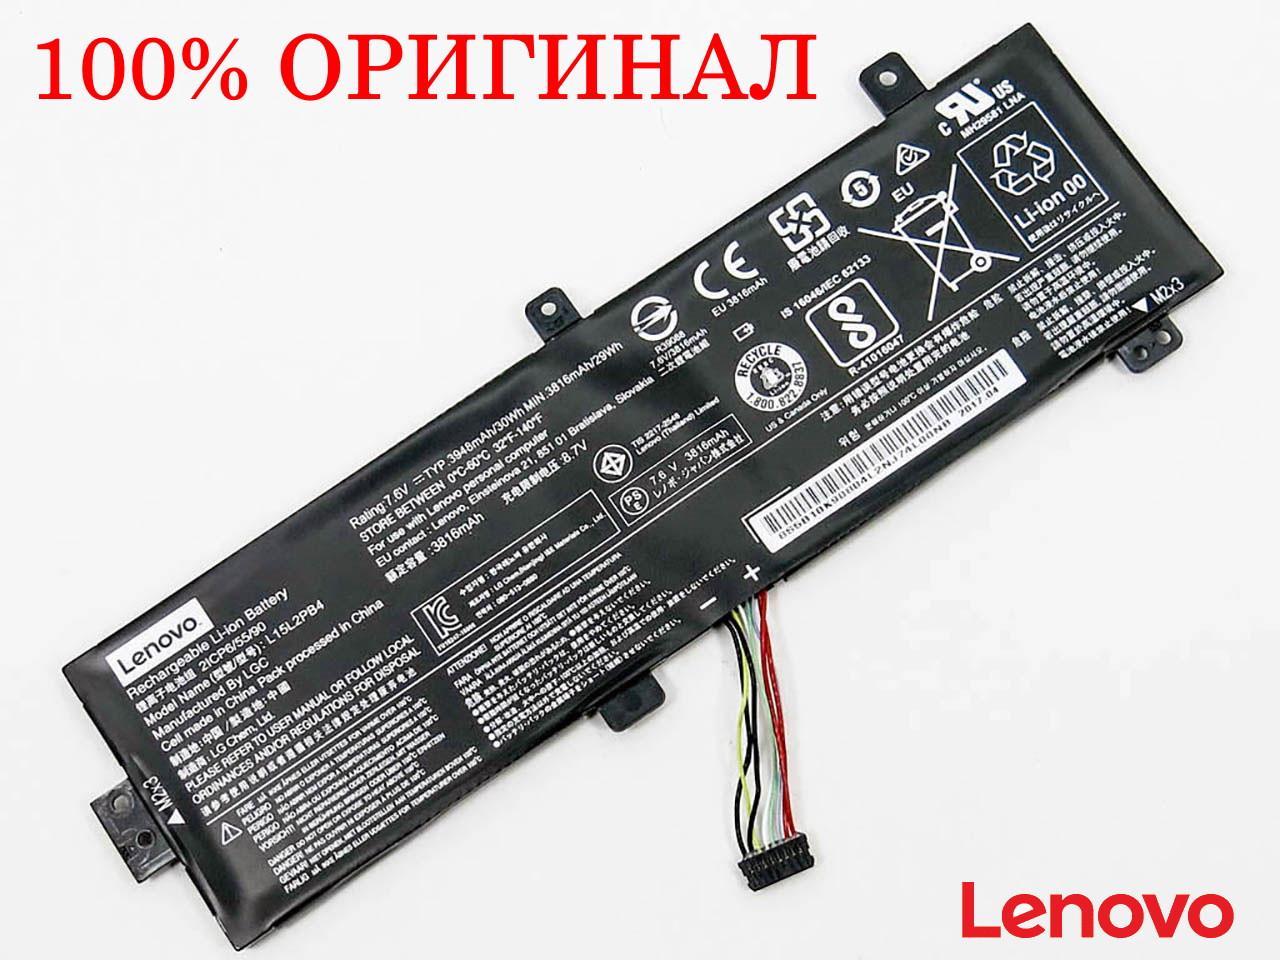 Оригинальная батарея для ноутбука Lenovo  L15L2PB4, L15C2PB5 (7.6V, 30Wh, 3948mAh) - Аккумулятор, АКБ